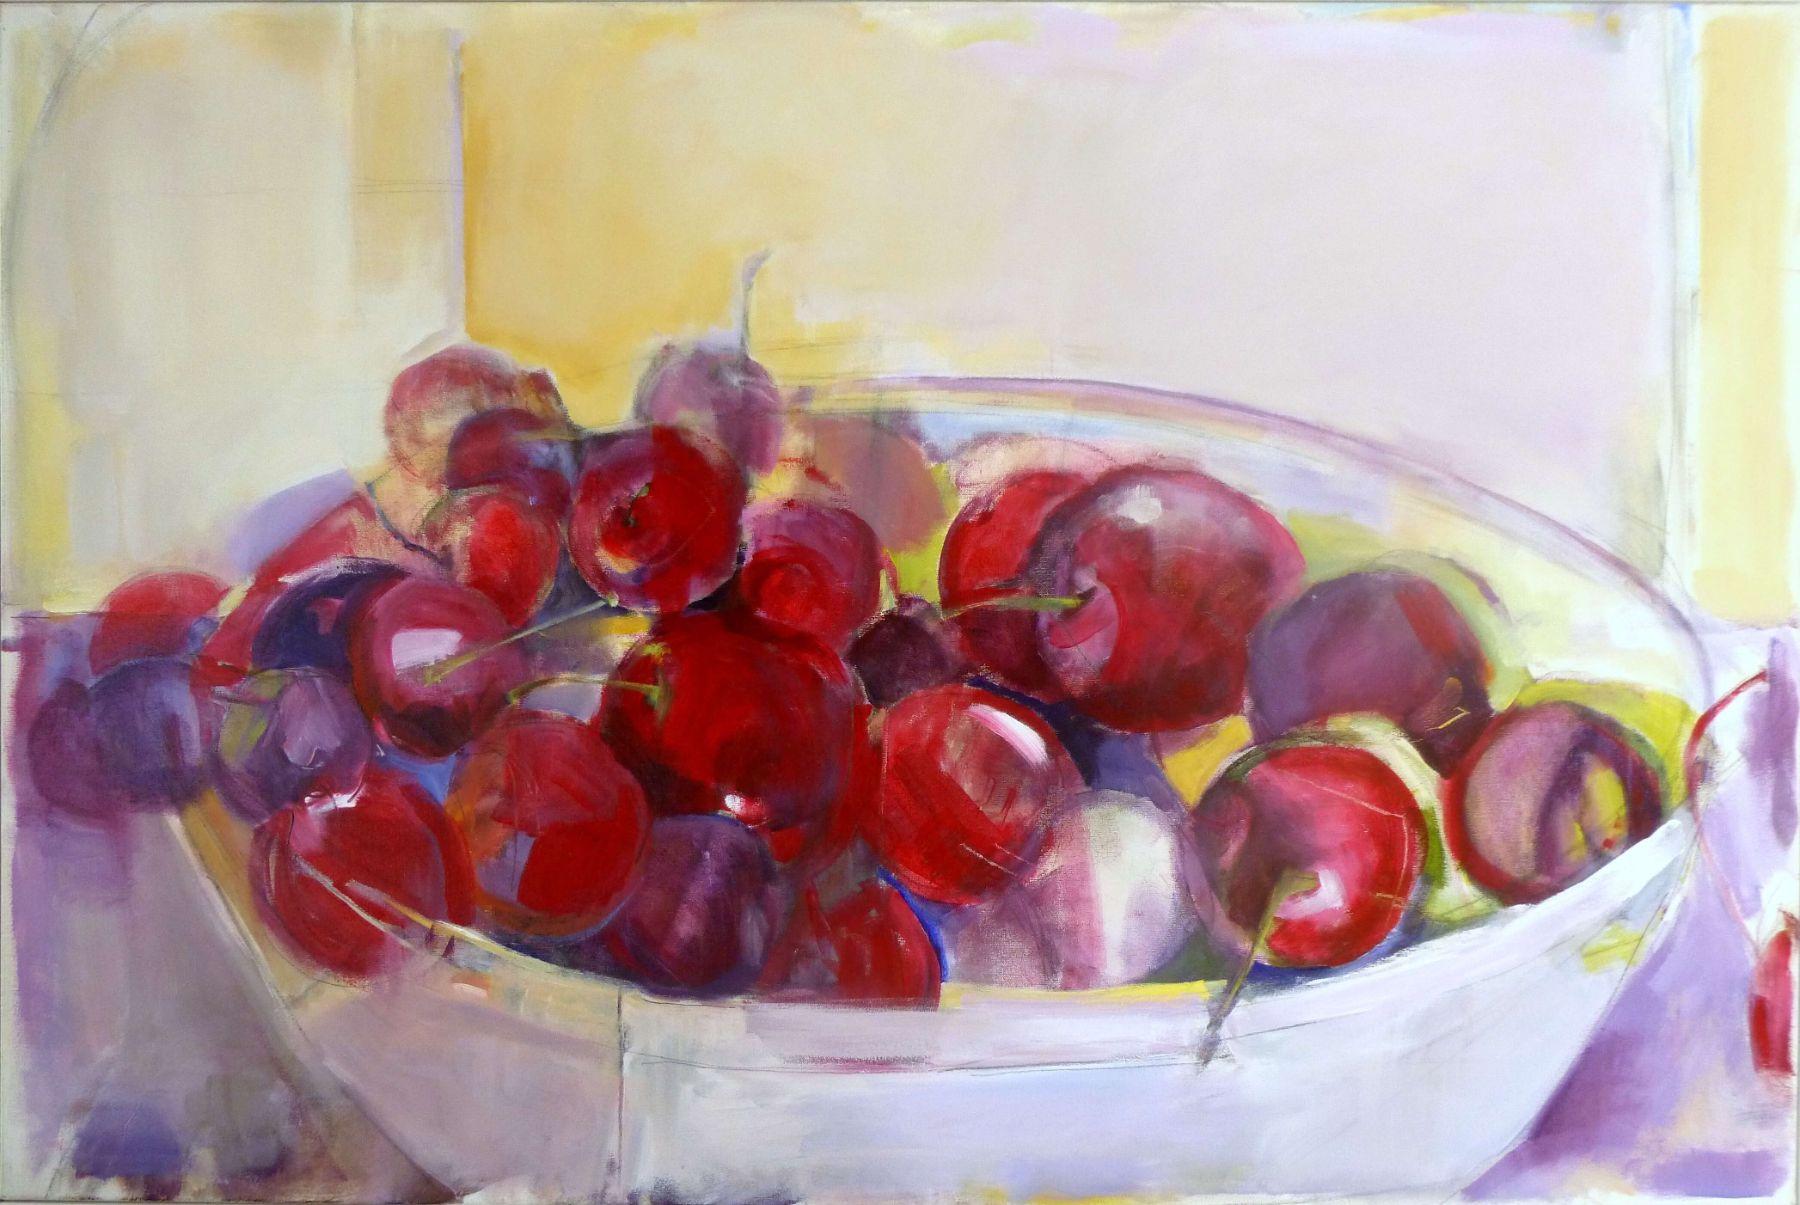 Cherries In A Bowl - painting, acrylic on canvas by artist Neva Bergemann